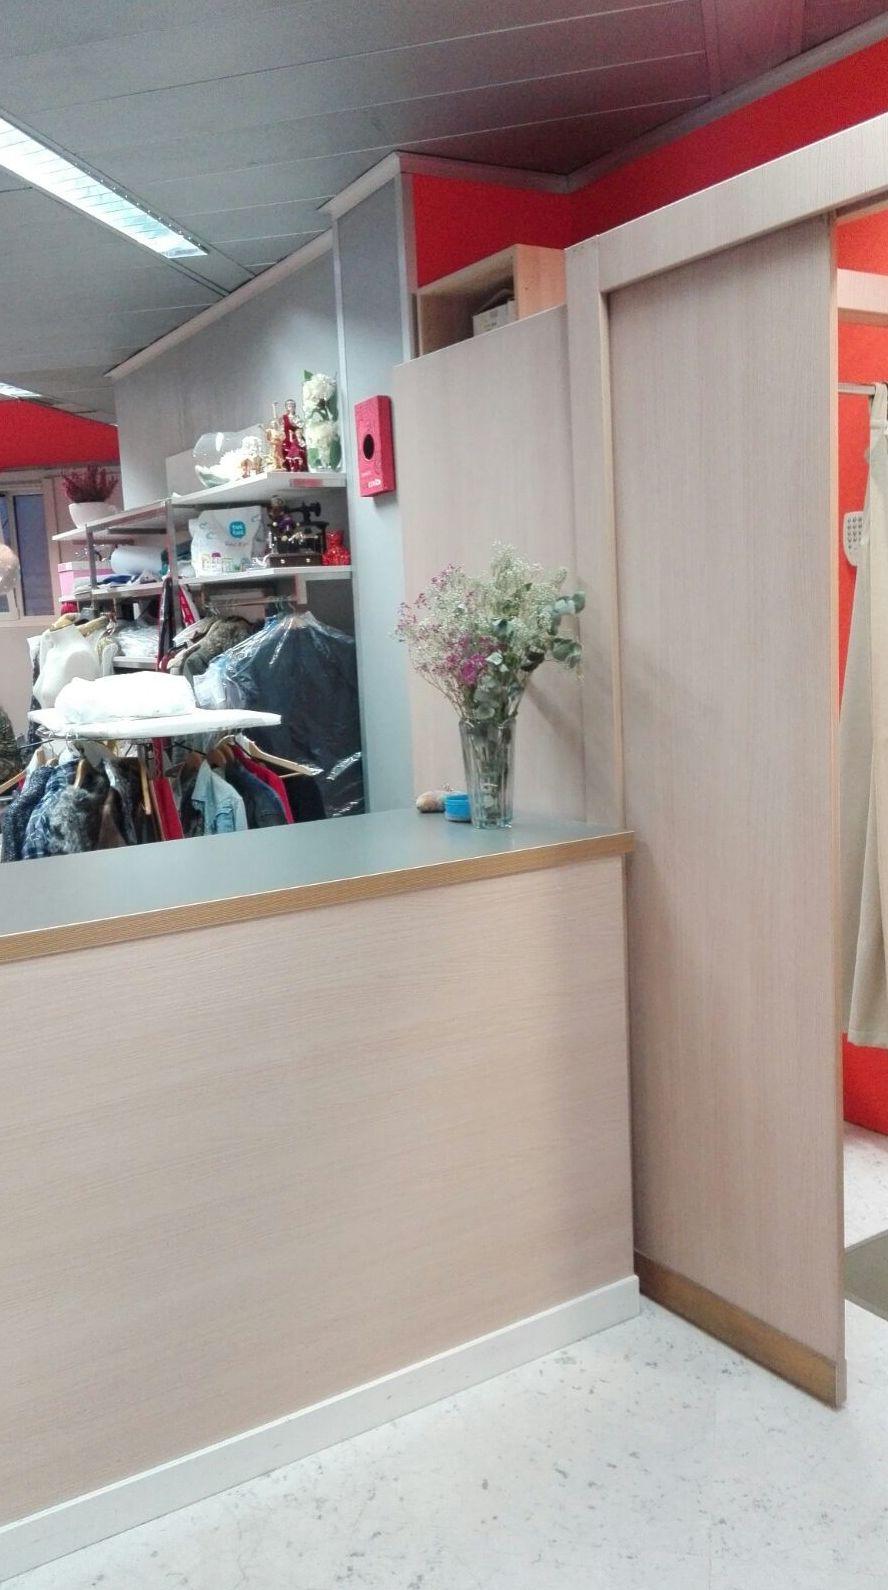 Foto 3 de Arreglos de ropa en Bilbao | A'Coser